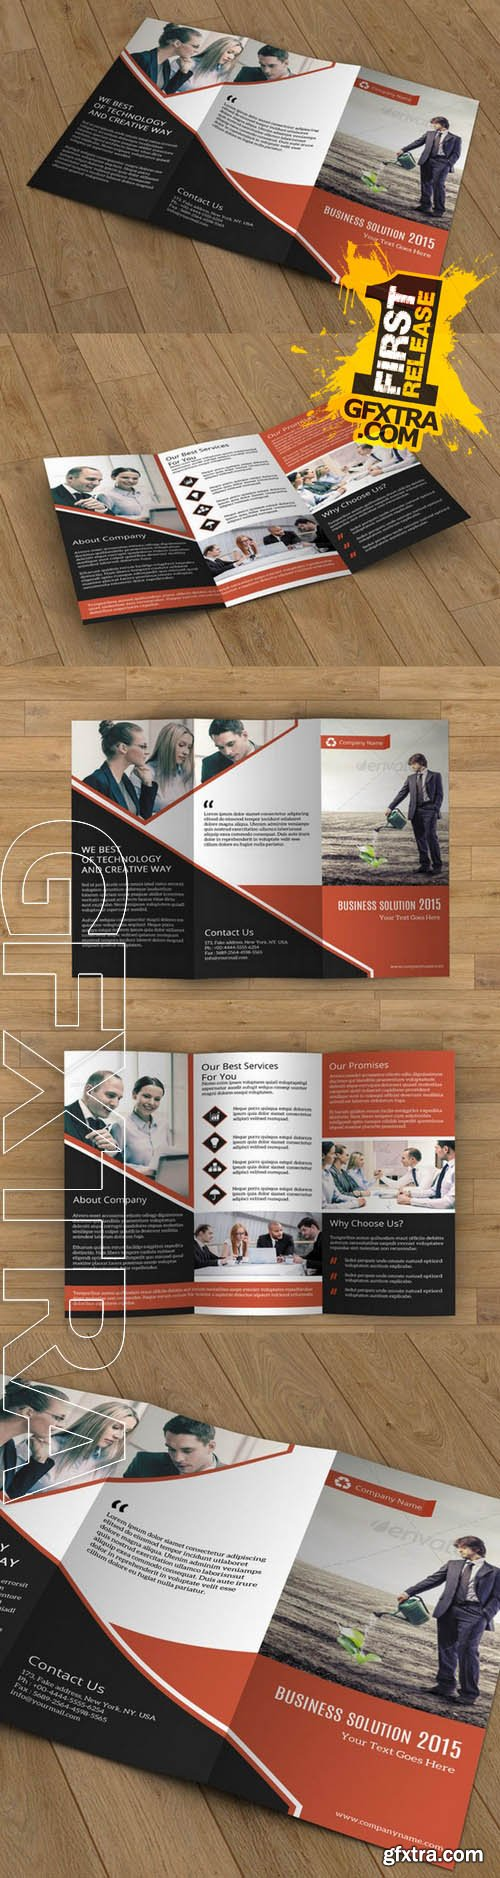 Business Brochure trifold - Creativemarket 110516